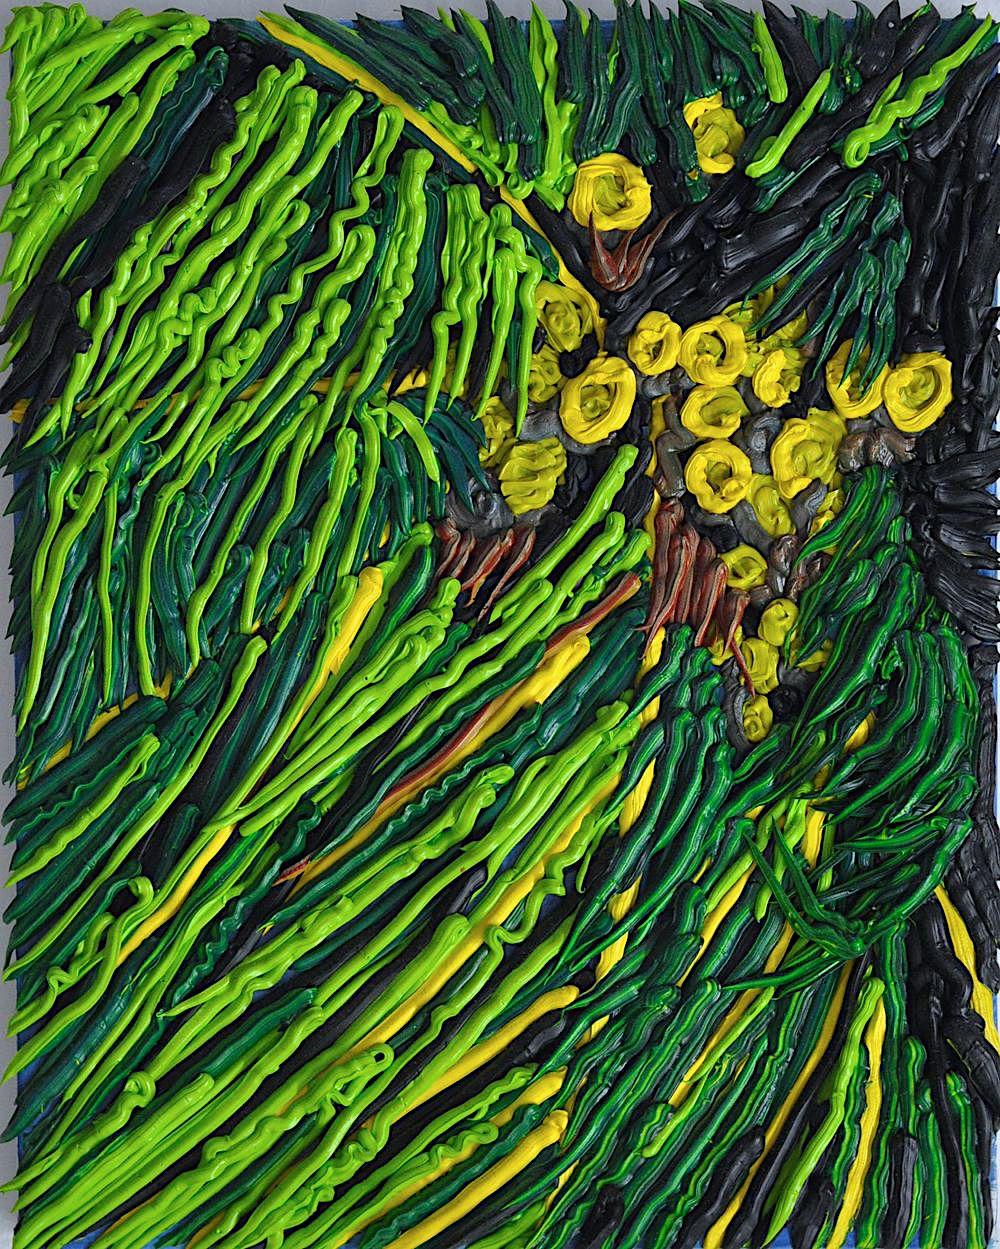 a Caroline Larsen painting of lush green and yellow vegetation